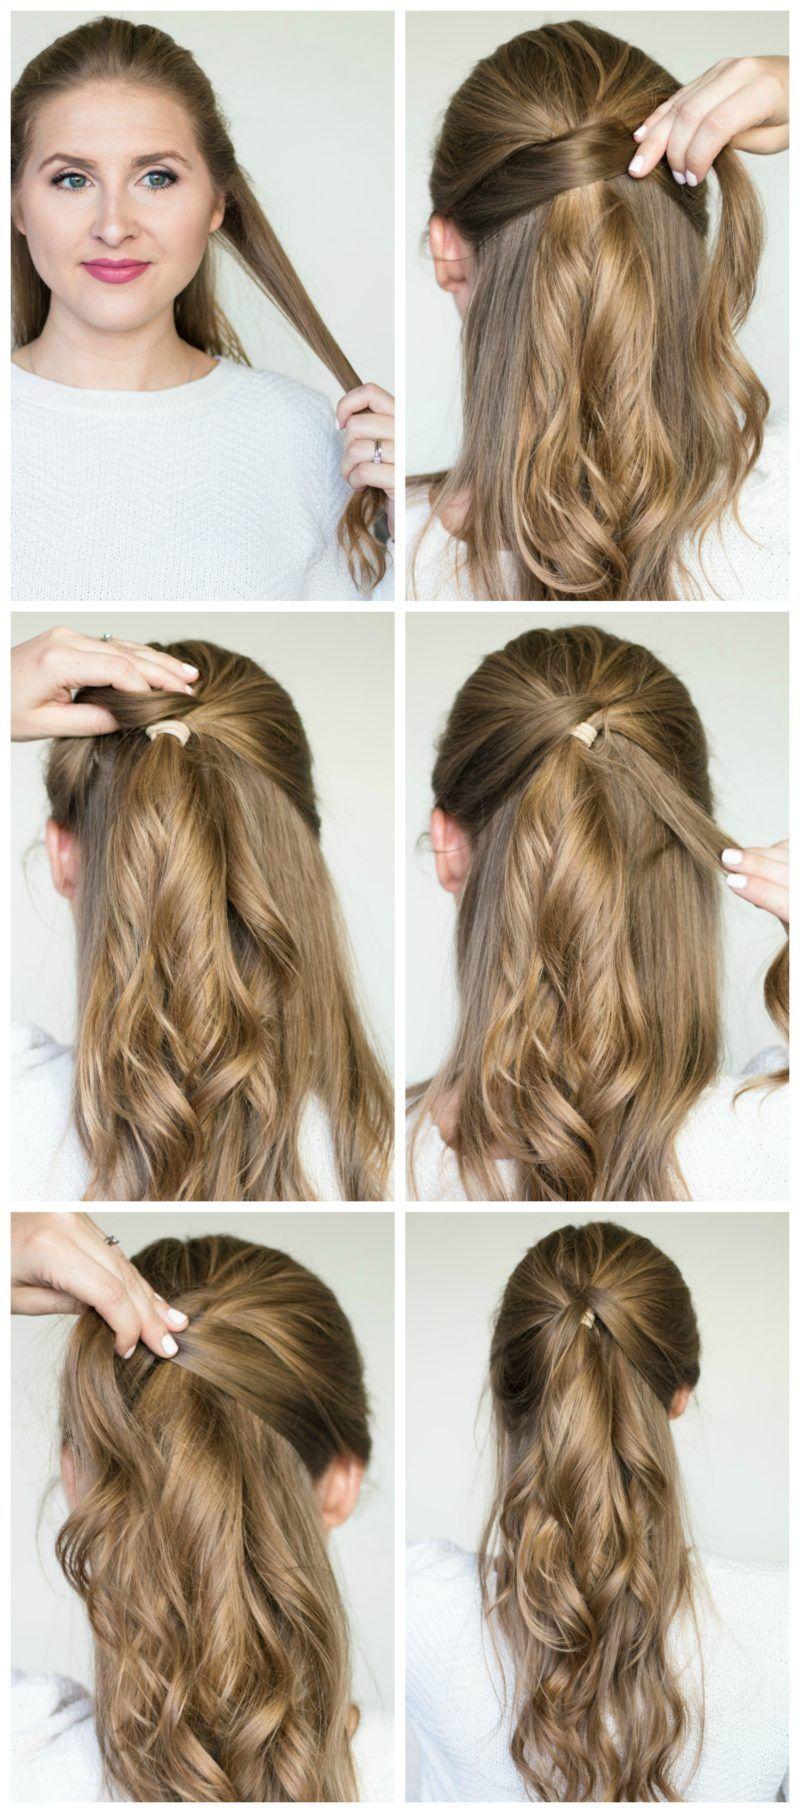 fancy-ponytail-hair-style-tutorial-pantene